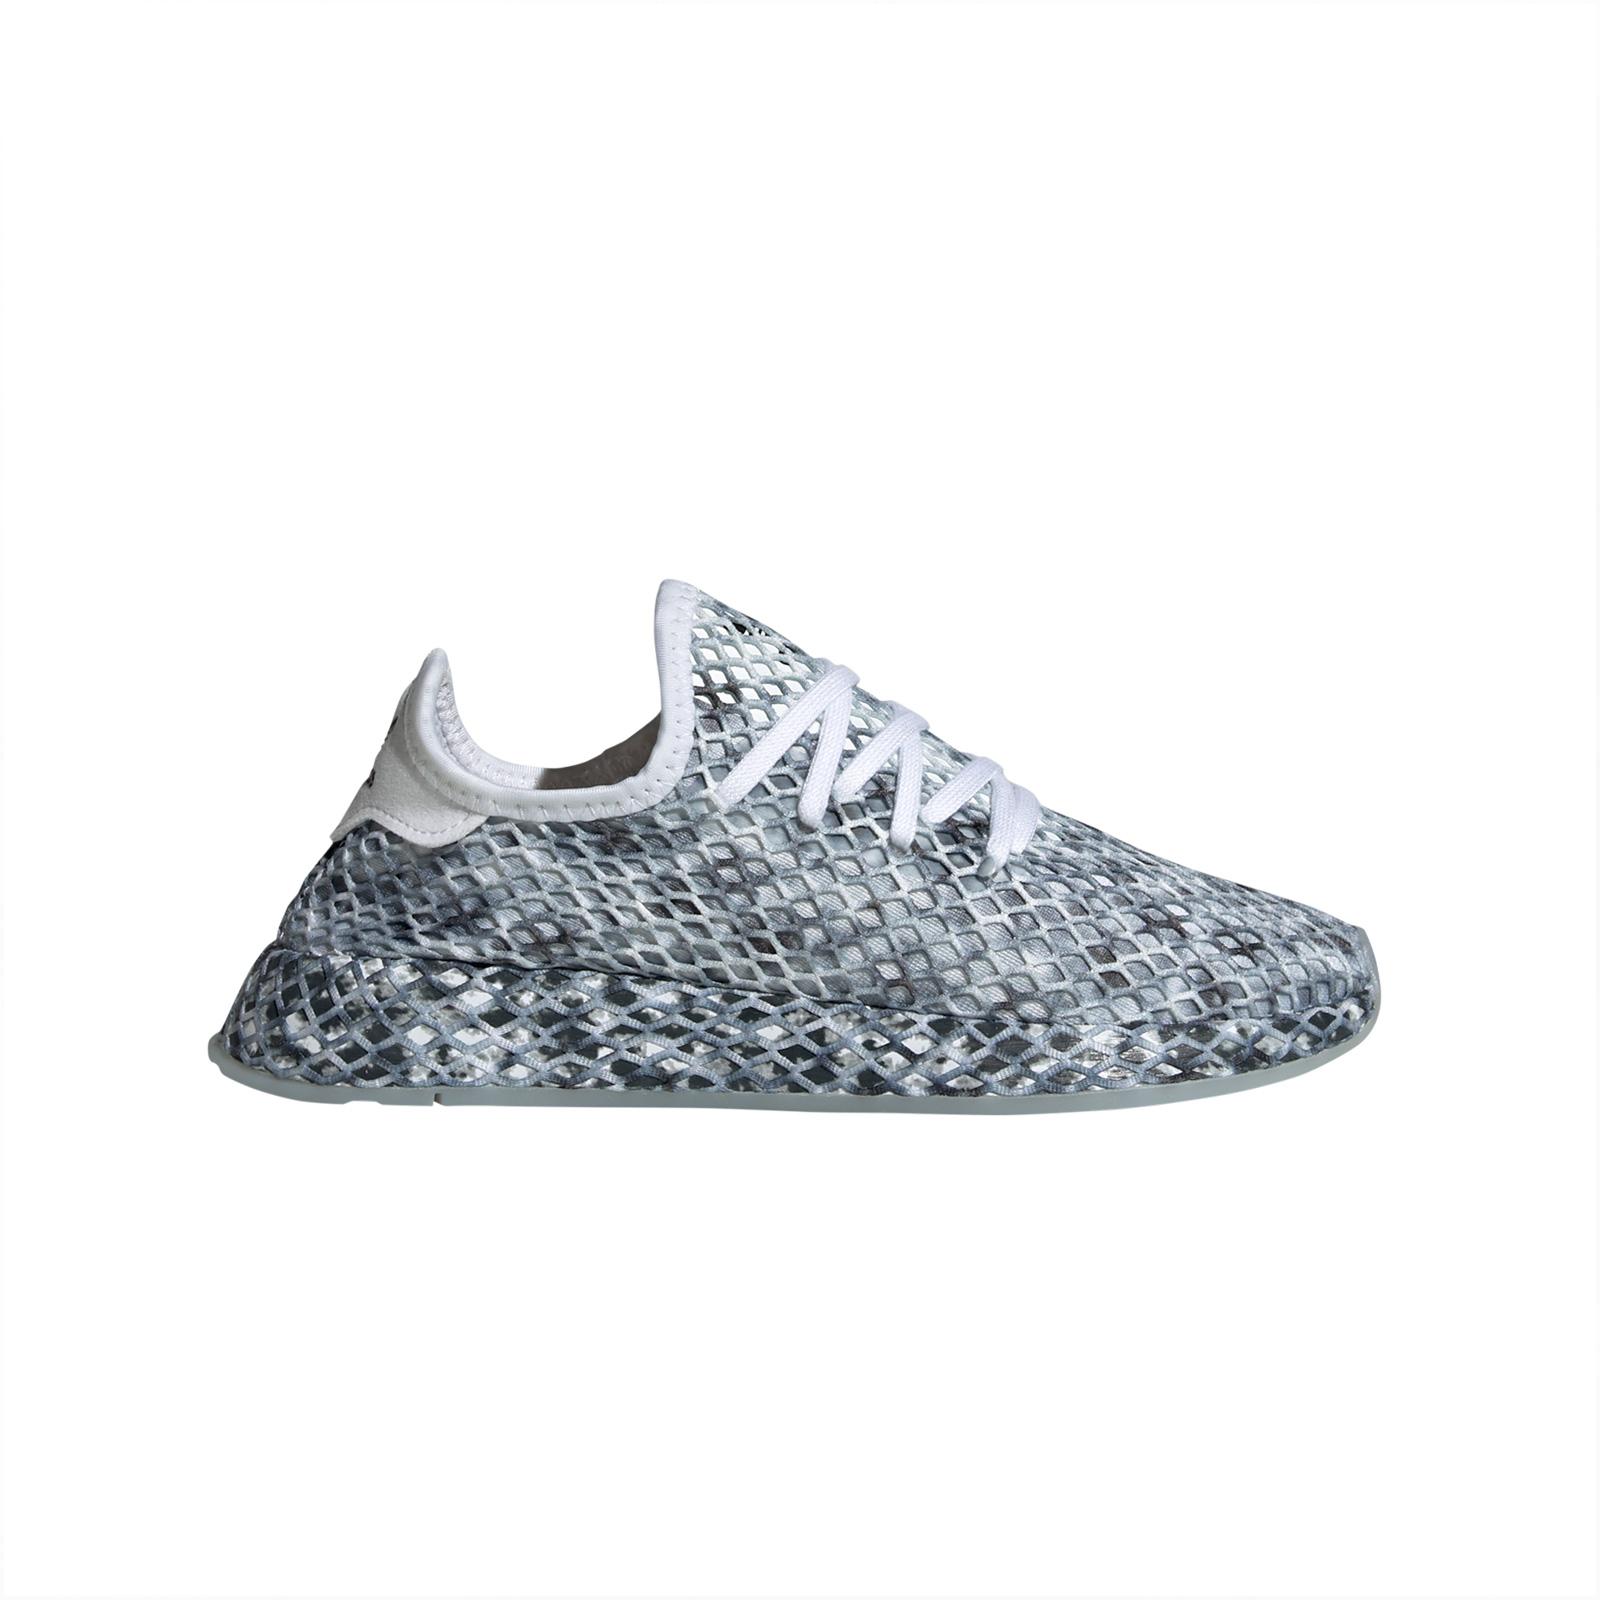 adidas Originals - DEERUPT RUNNER W - FTWWHT/CBLACK/CBLACK